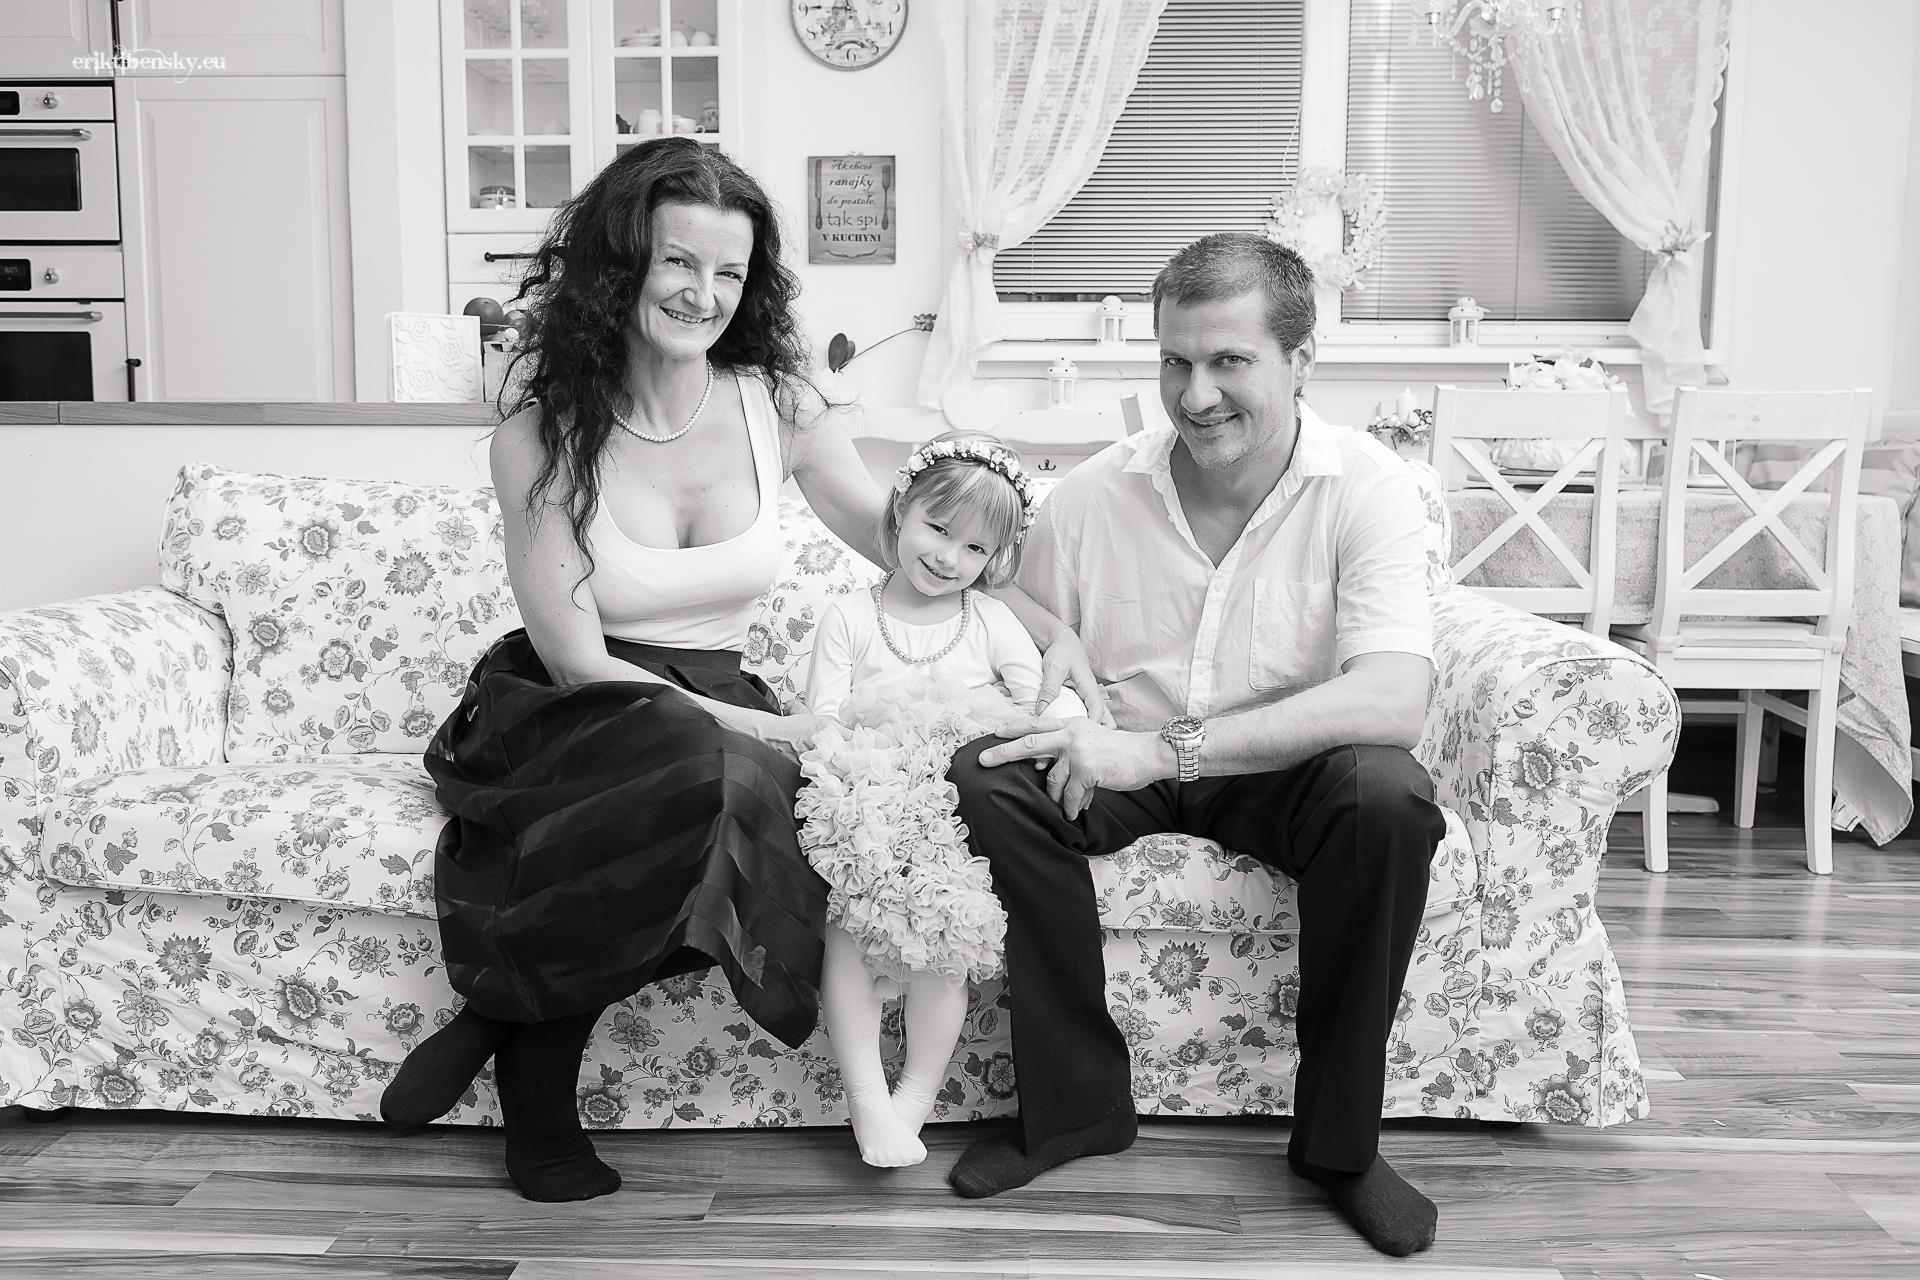 eriktibensky-eu-fotograf-home-photo-family-rodina-kids-deti-1025